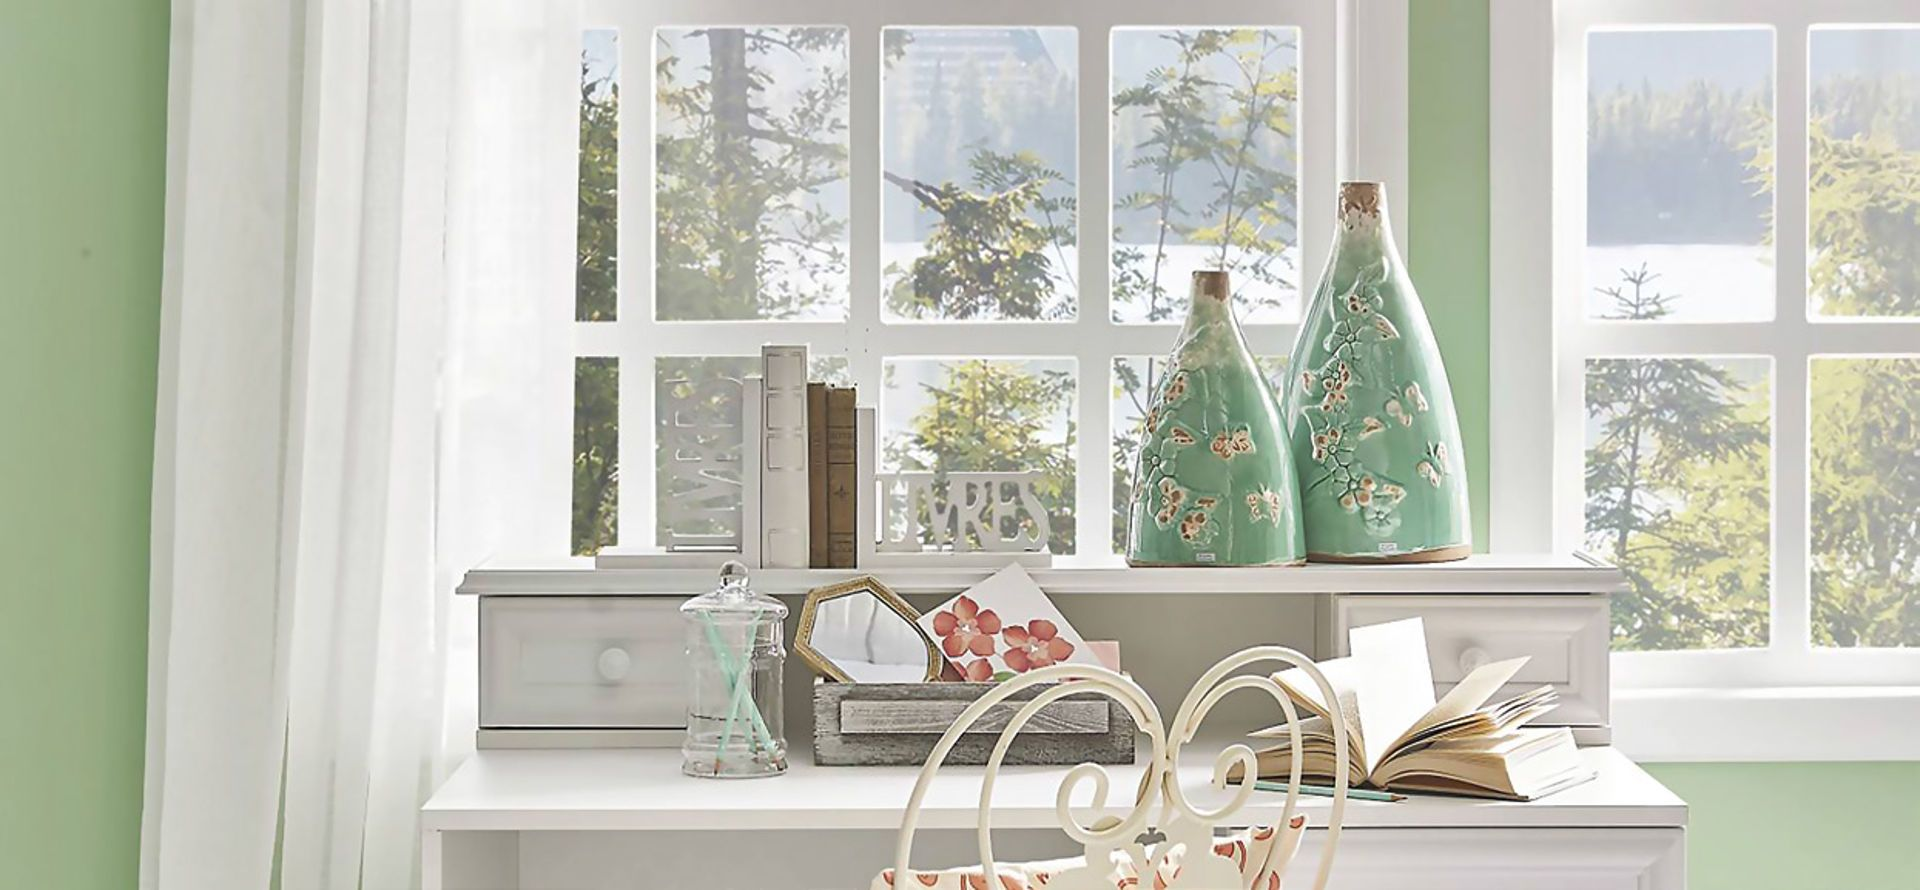 Tepe image of home decor